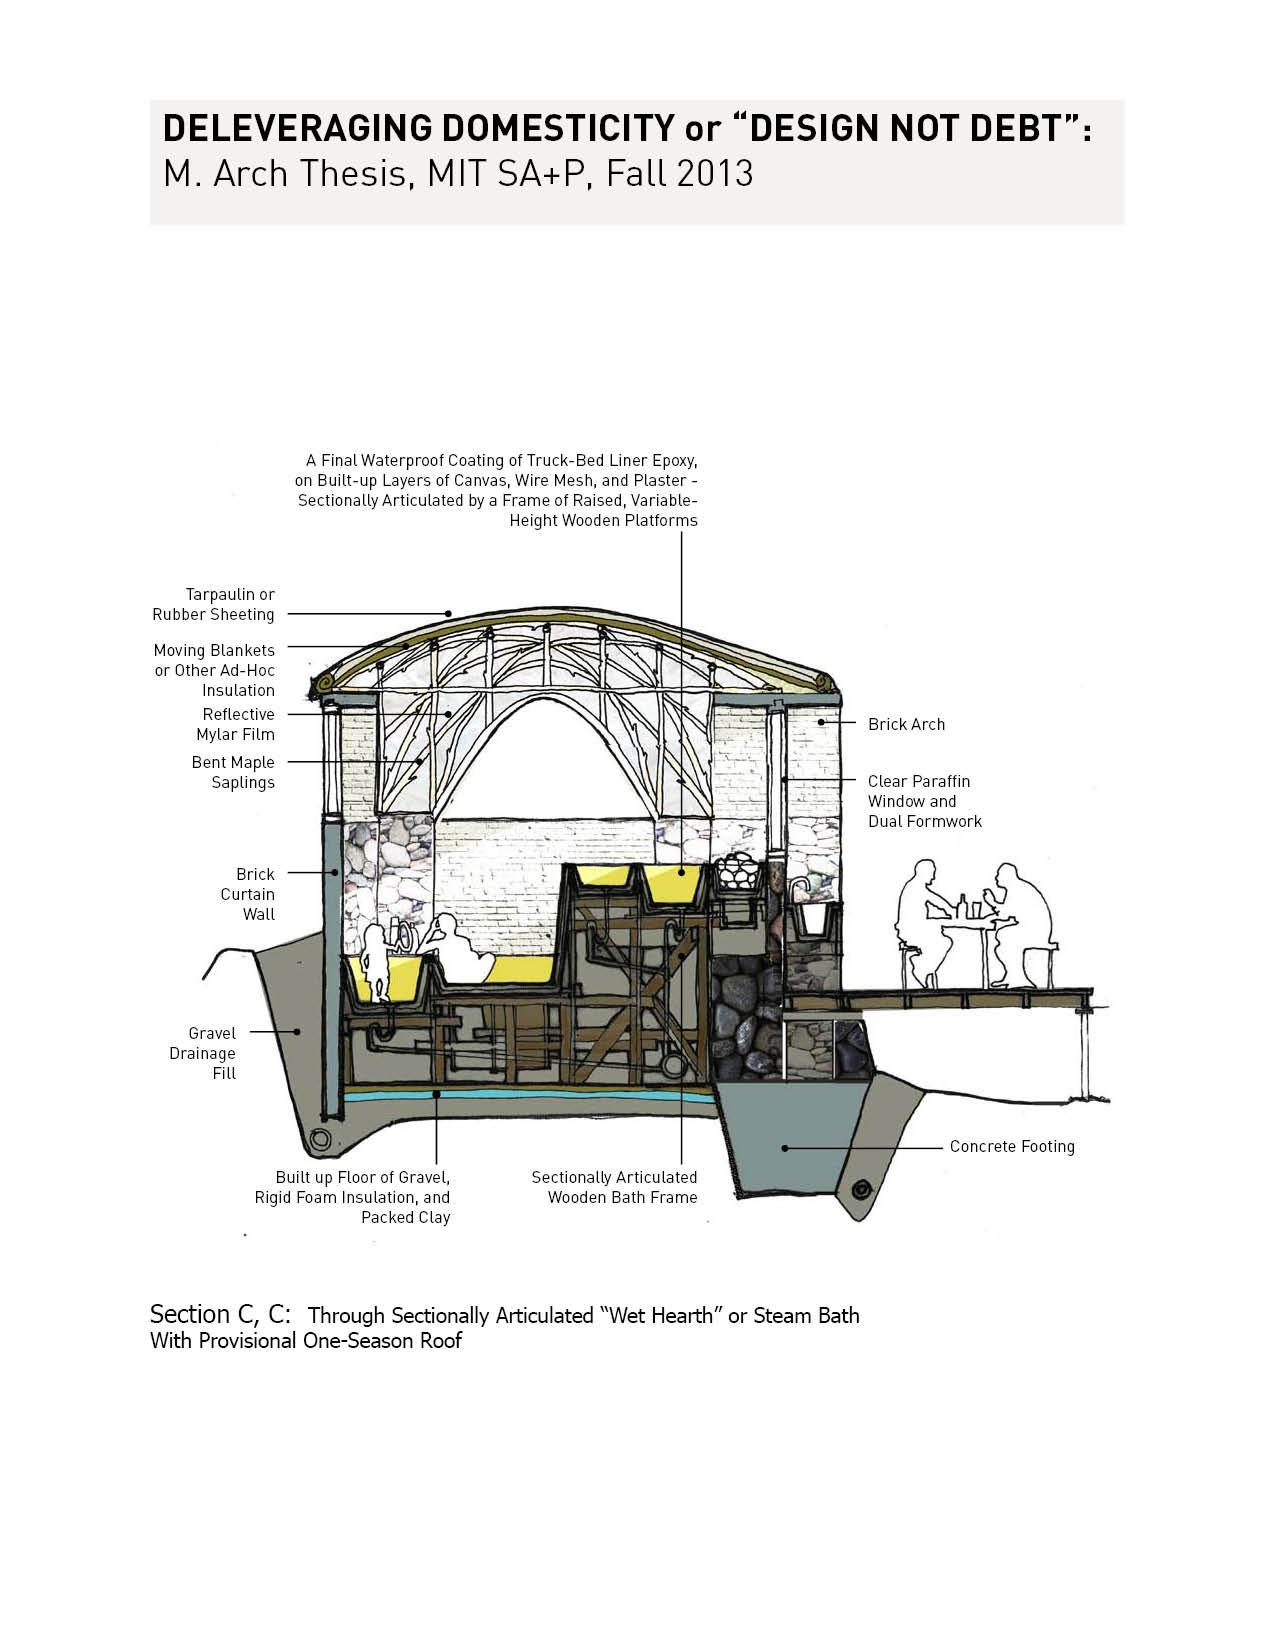 MIT_thesis42.jpg